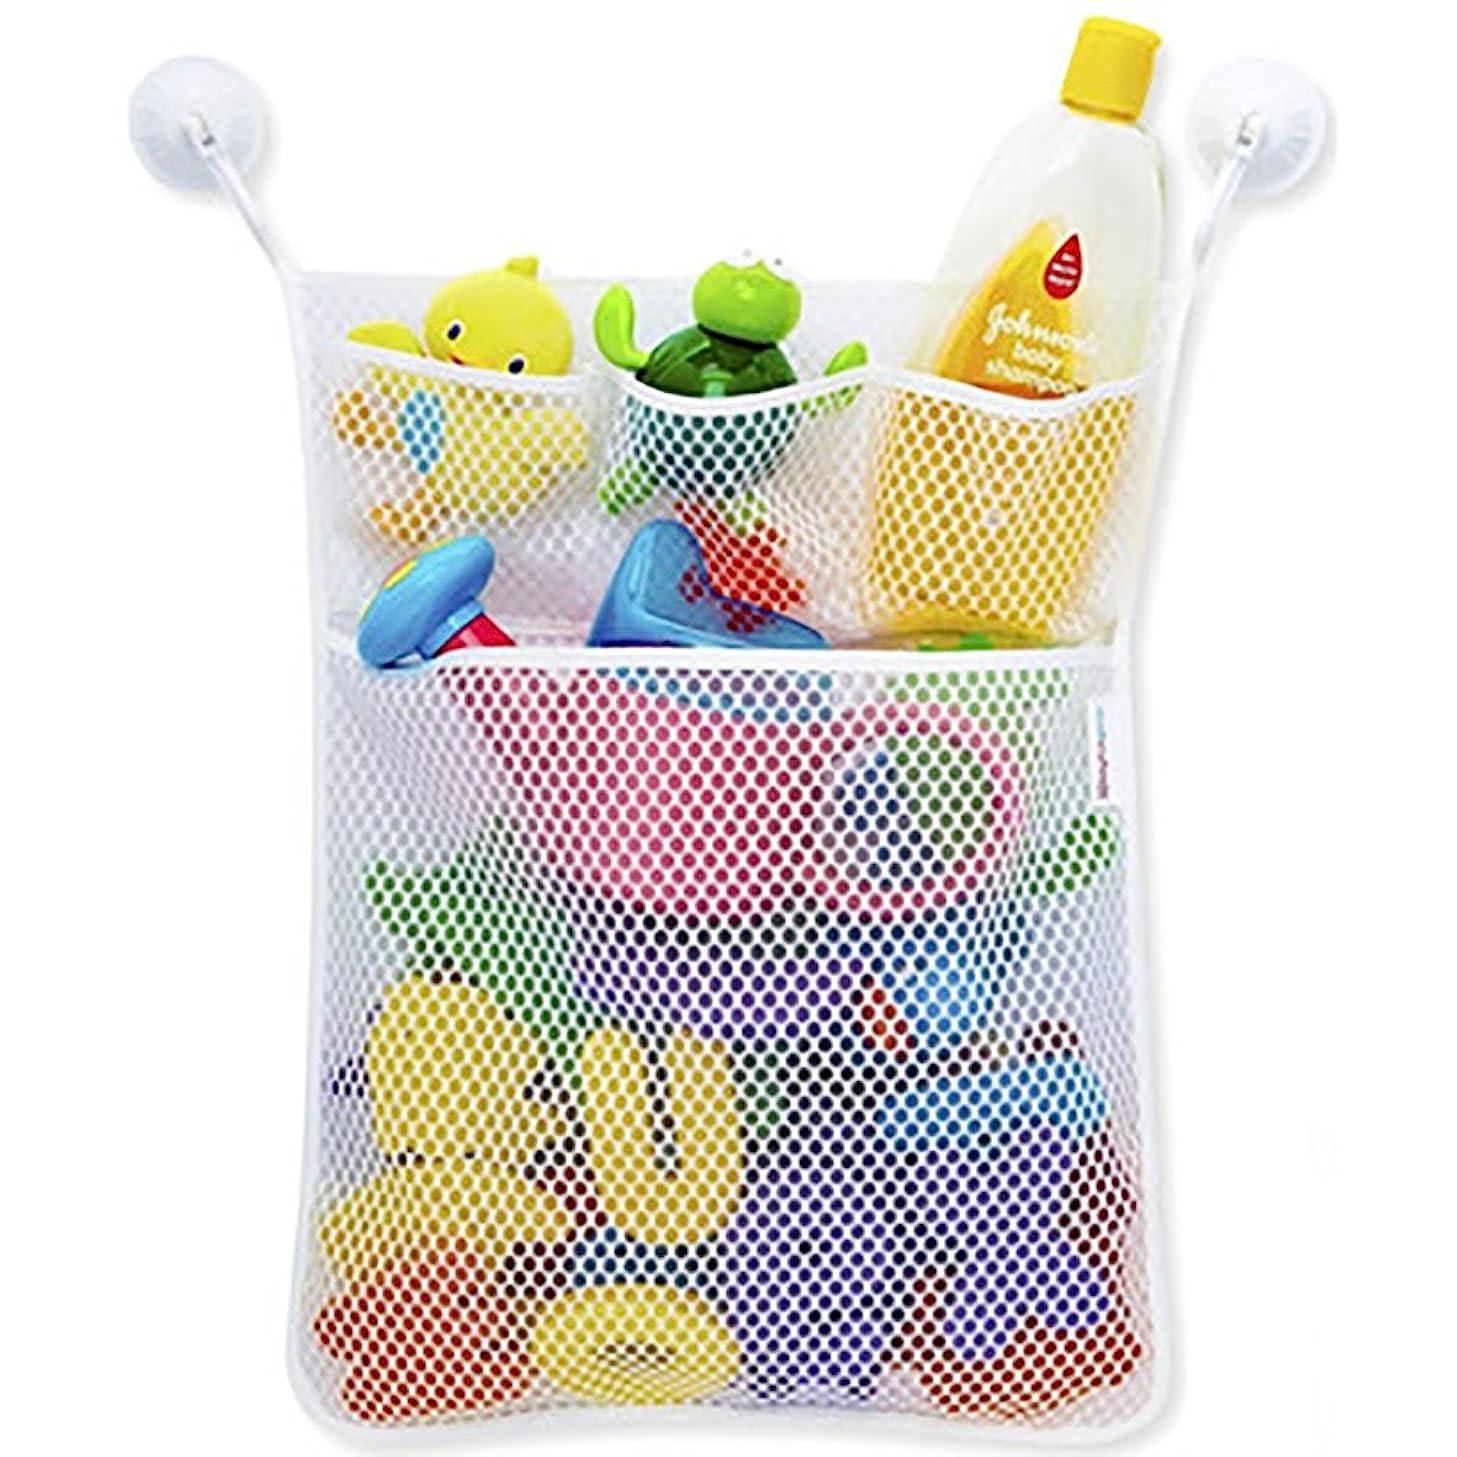 Transer Baby Toy Mesh Storage Bag Bath Bathtub Doll Washable Organize Bag with Suction Cup (White)